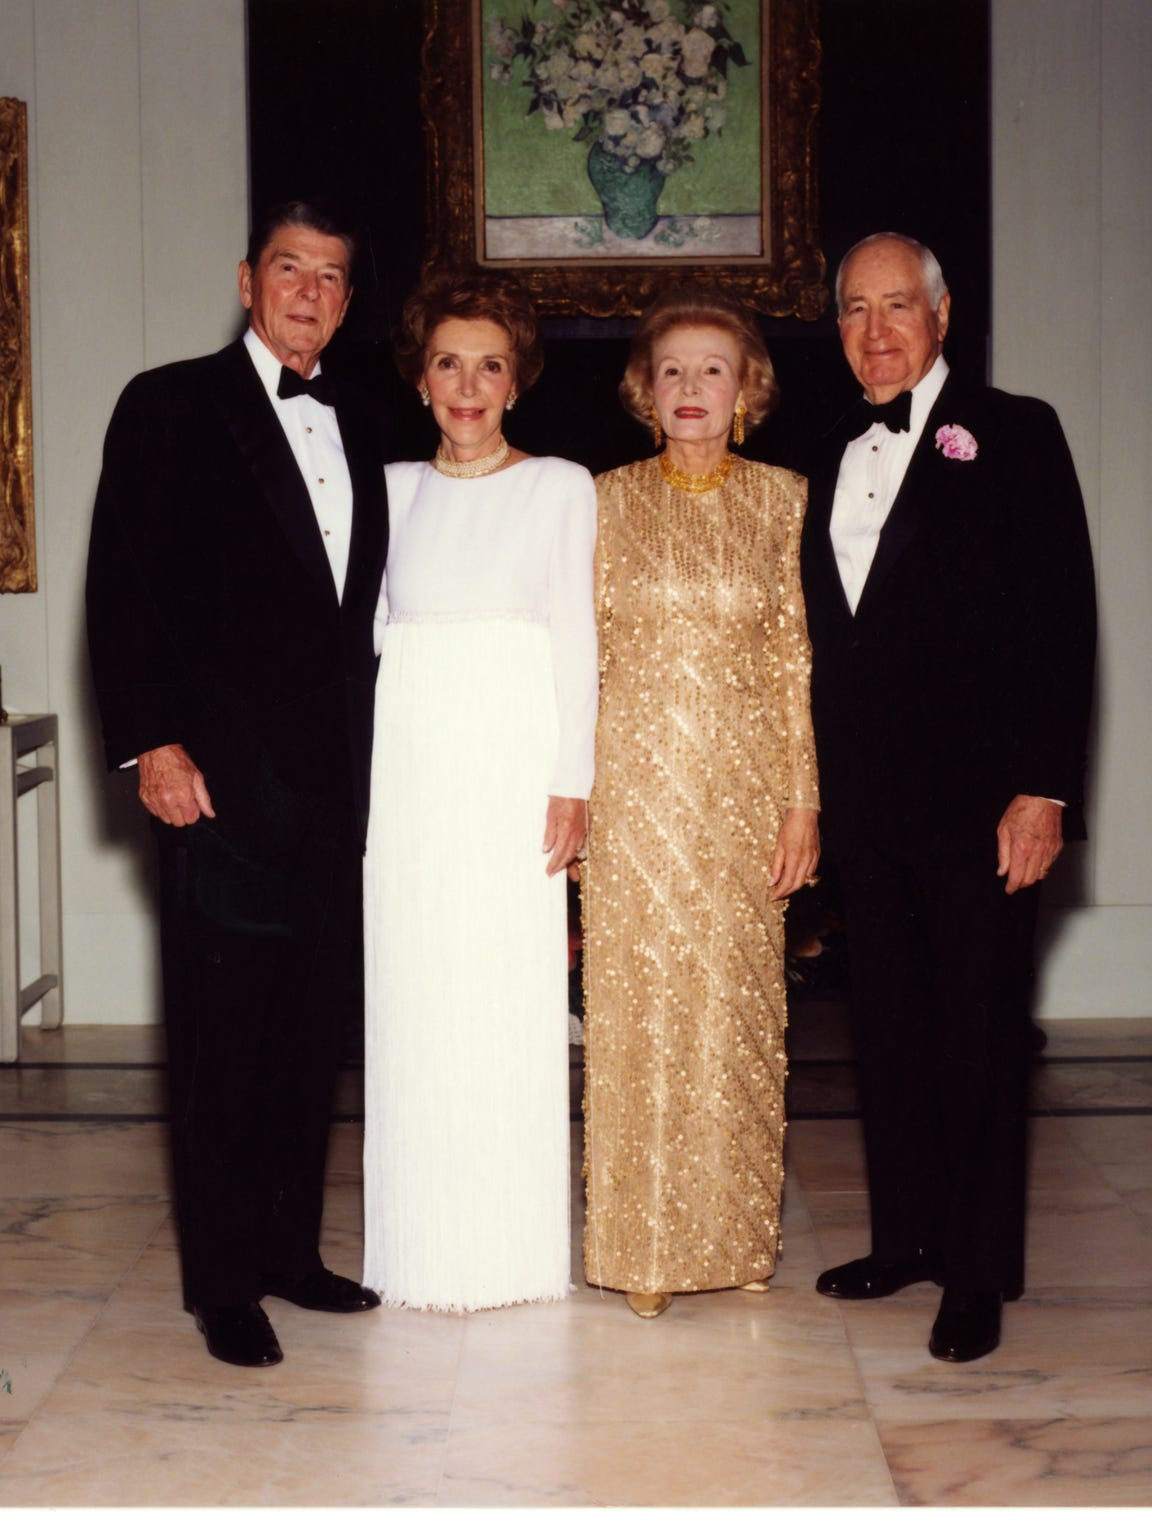 President Ronald Reagan and First Lady Nancy Reagan